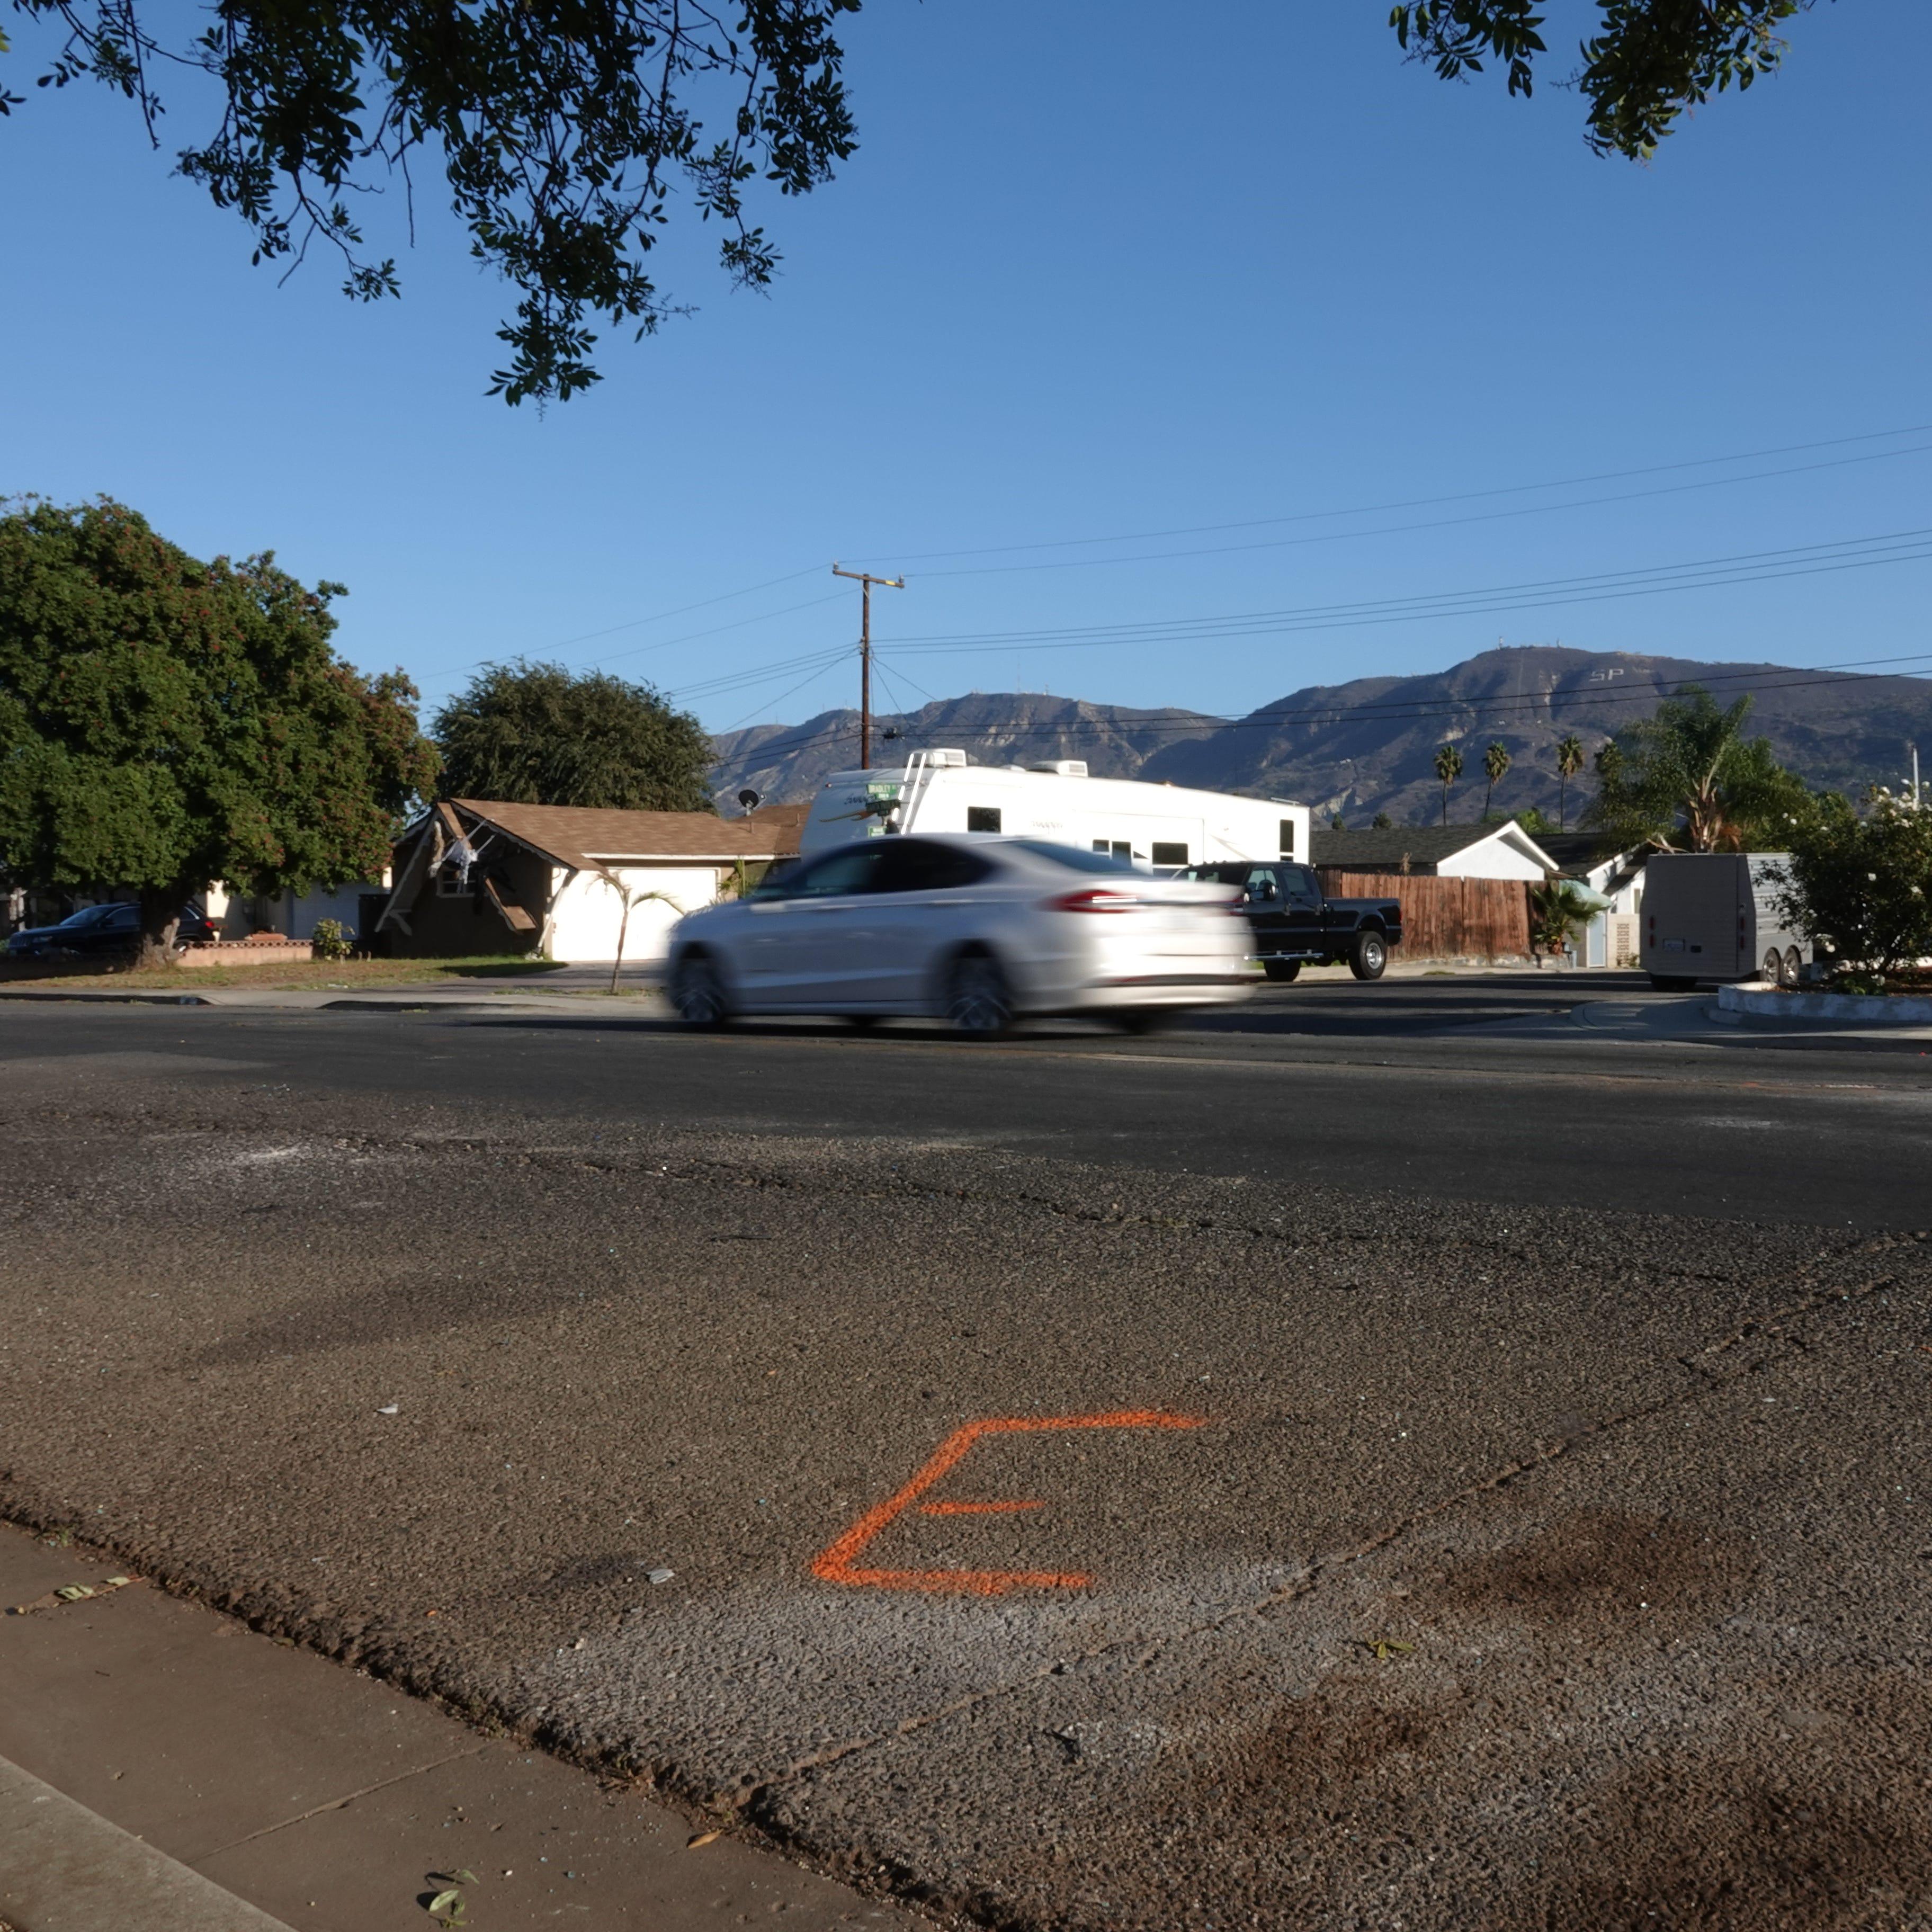 Fatal crash in Santa Paula, collisions in Thousand Oaks and near Ojai